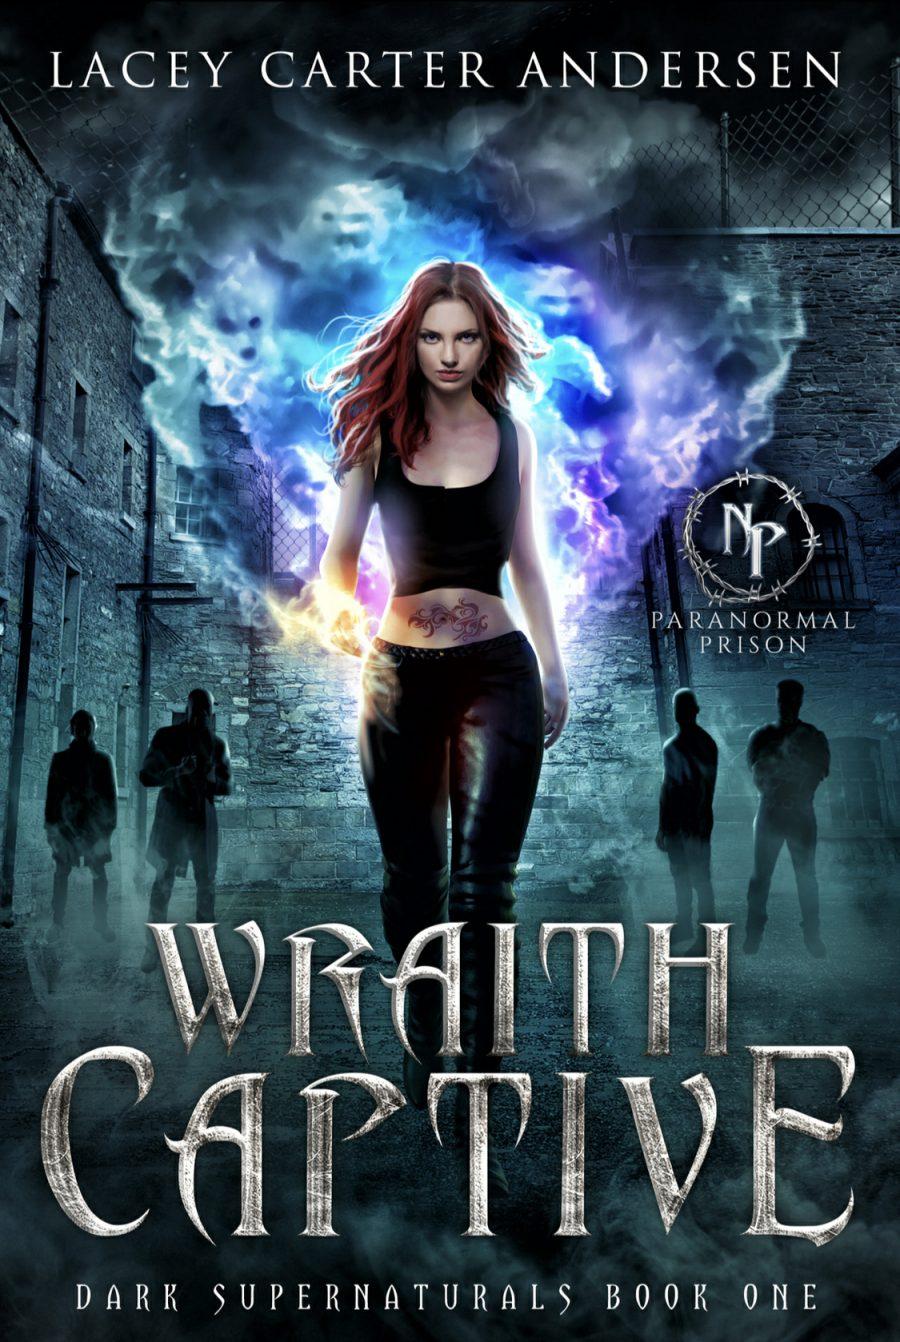 Wraith Captive by Lacey Carter Anderson - A Book Review #FastBurn #RH #PNR #4Stars #ParanormalPrison #KindleUnlimited #KU